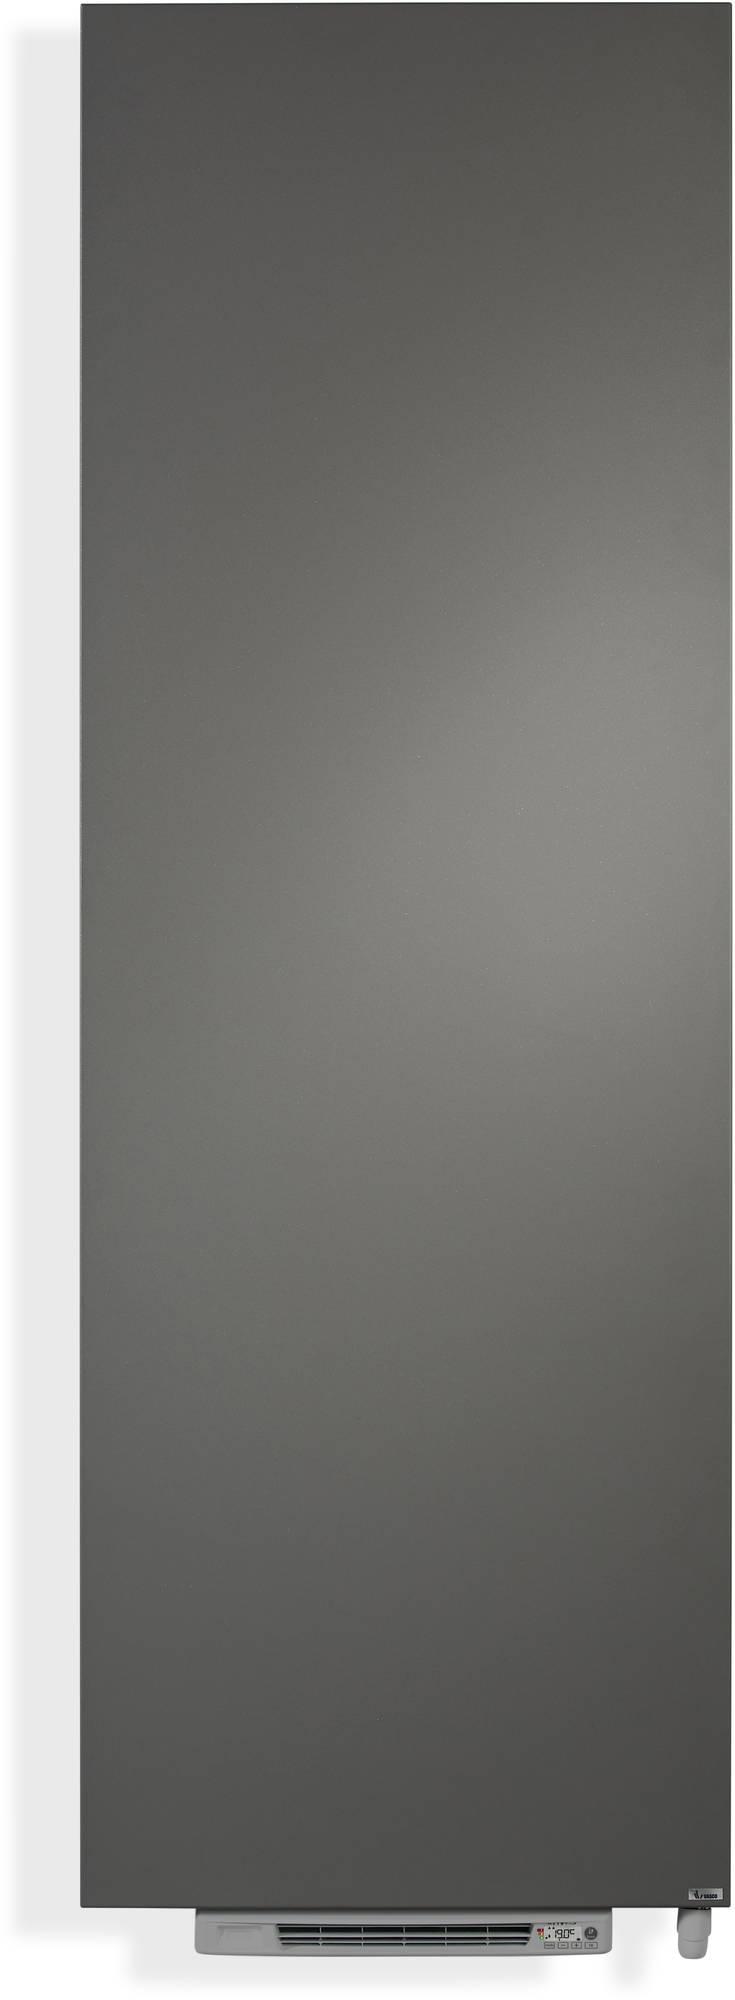 Vasco Niva N1L1-EL Blower elektrische radiator 129x62cm 2000W Wit Structuur